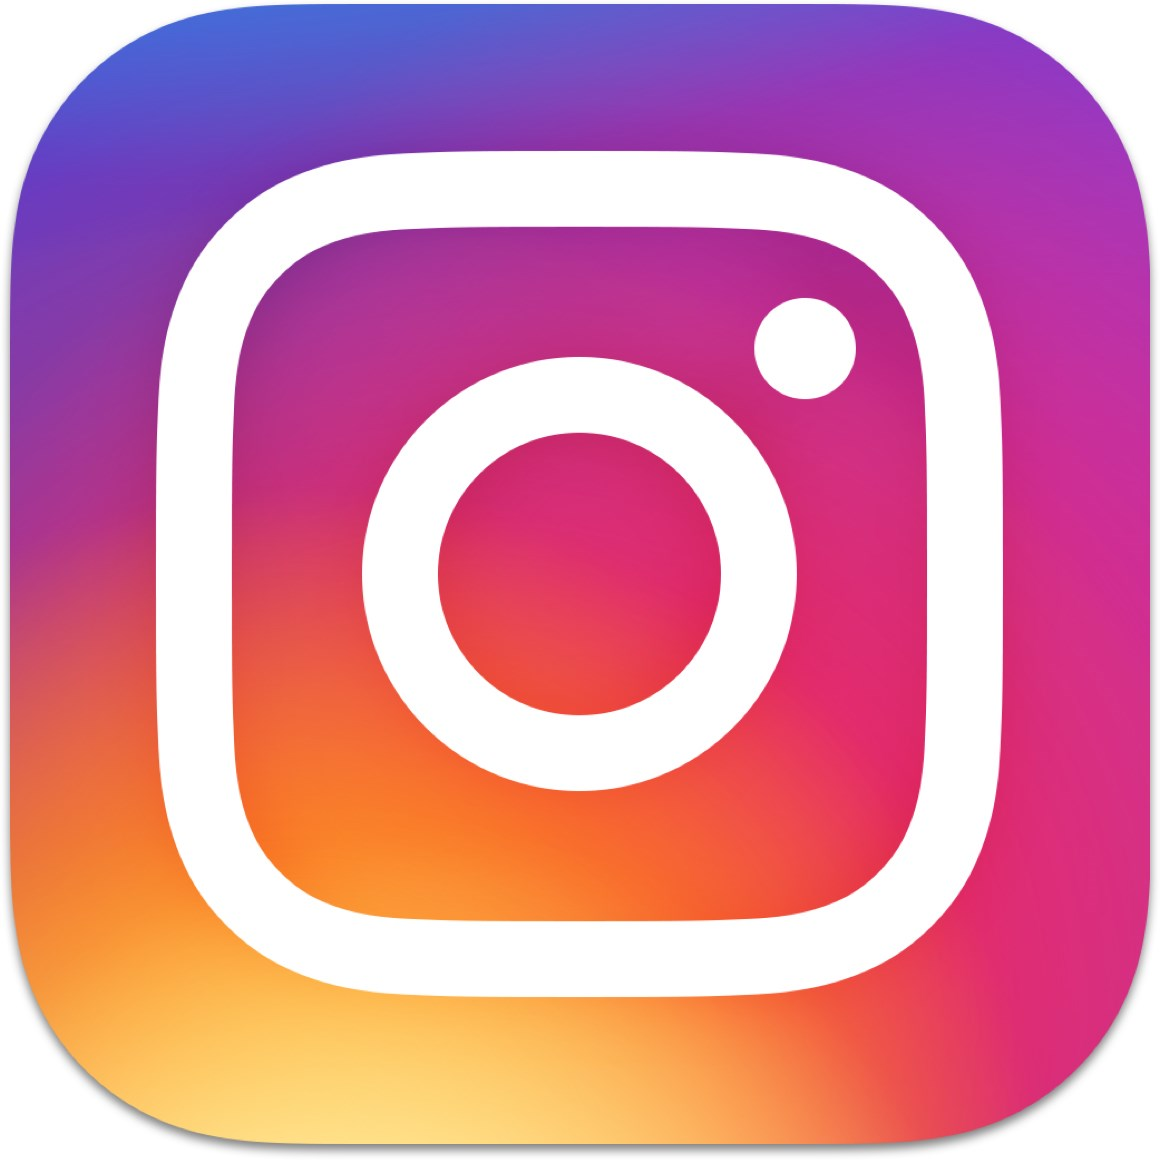 Mikaelas Instagram